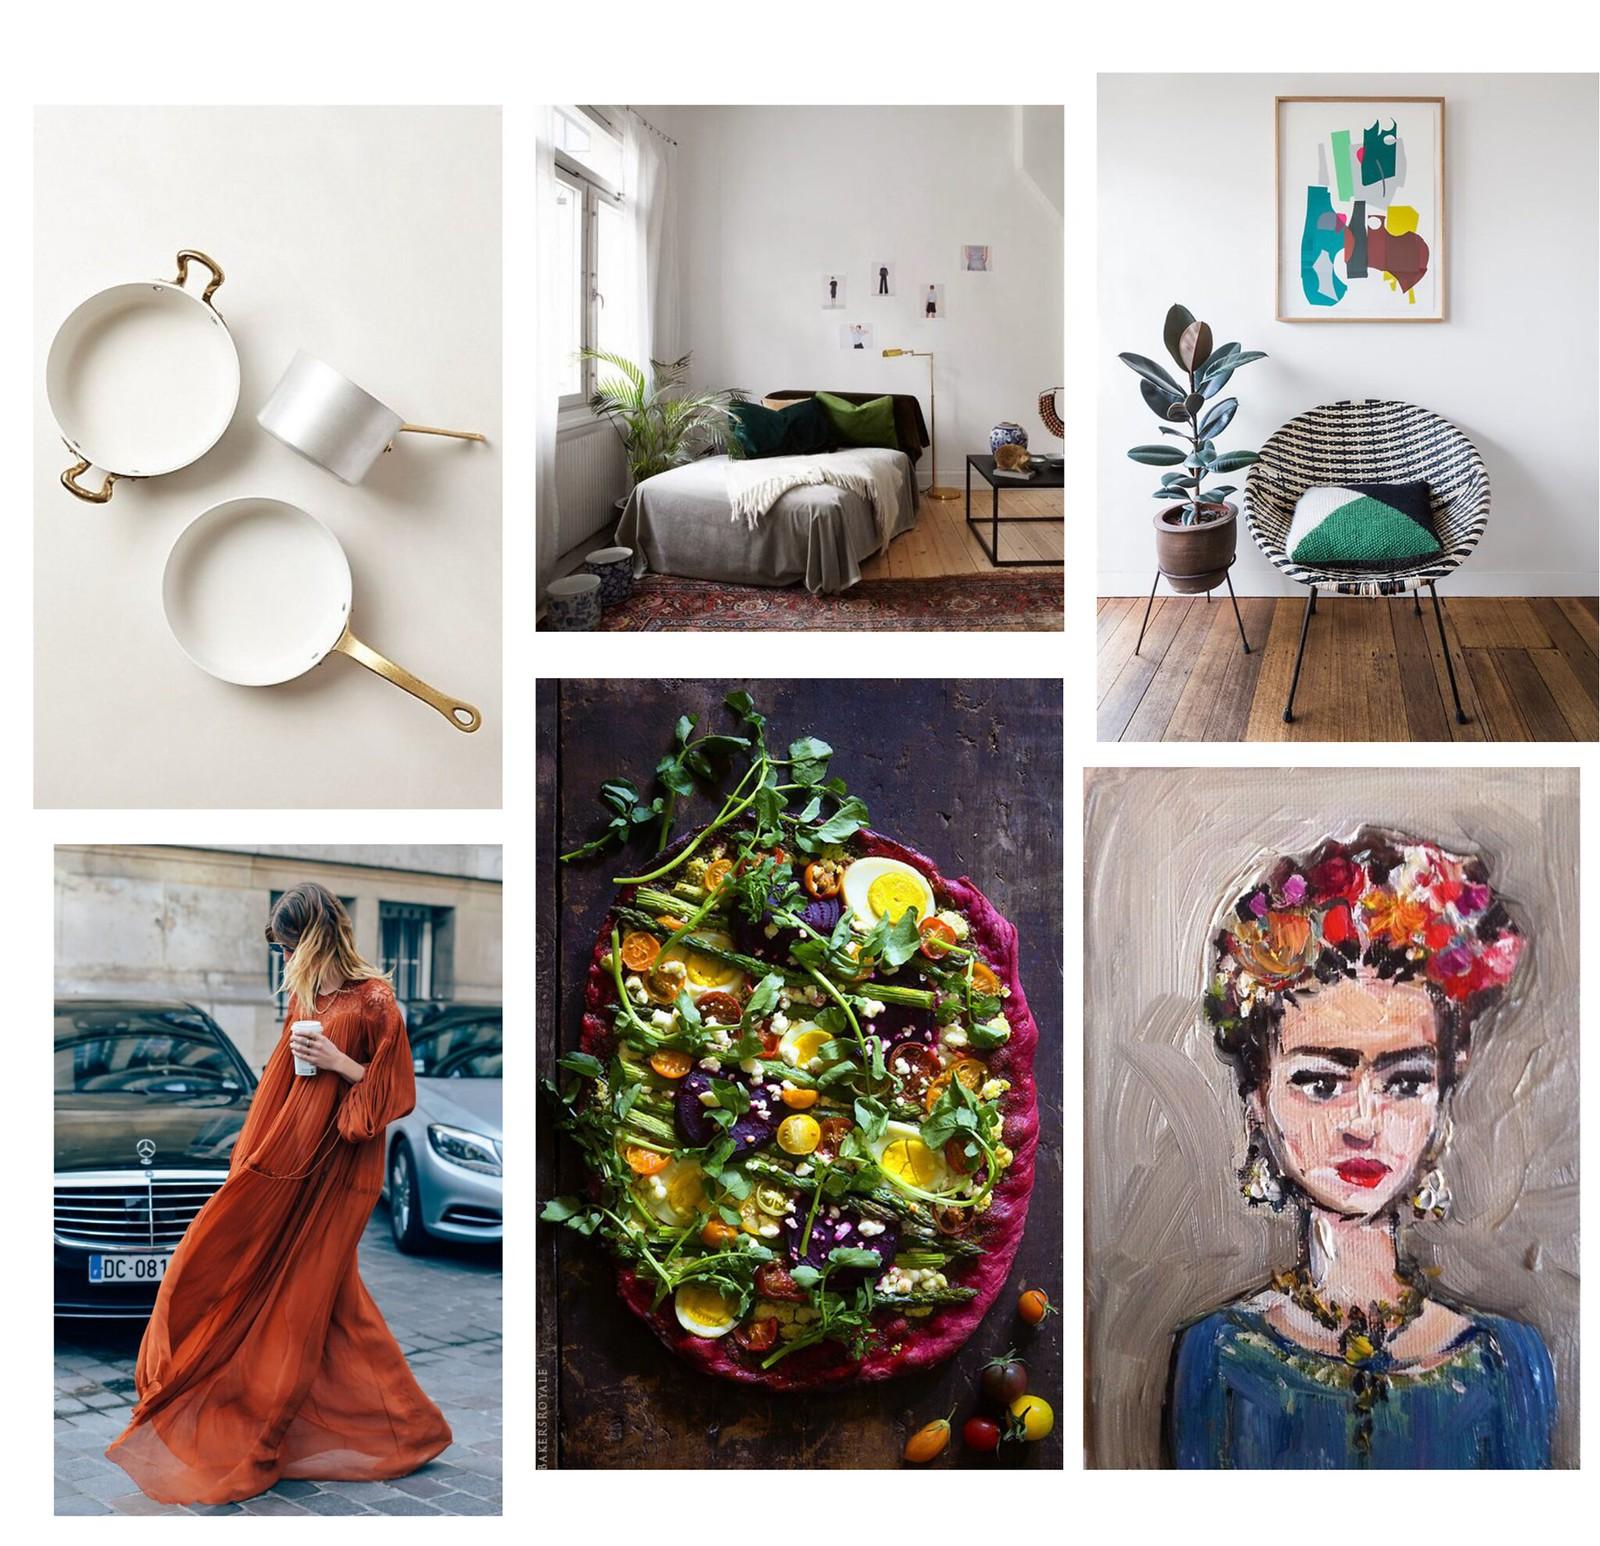 frida kahlo painting, boho chic dress, rödbetspizza, emaljkastruller